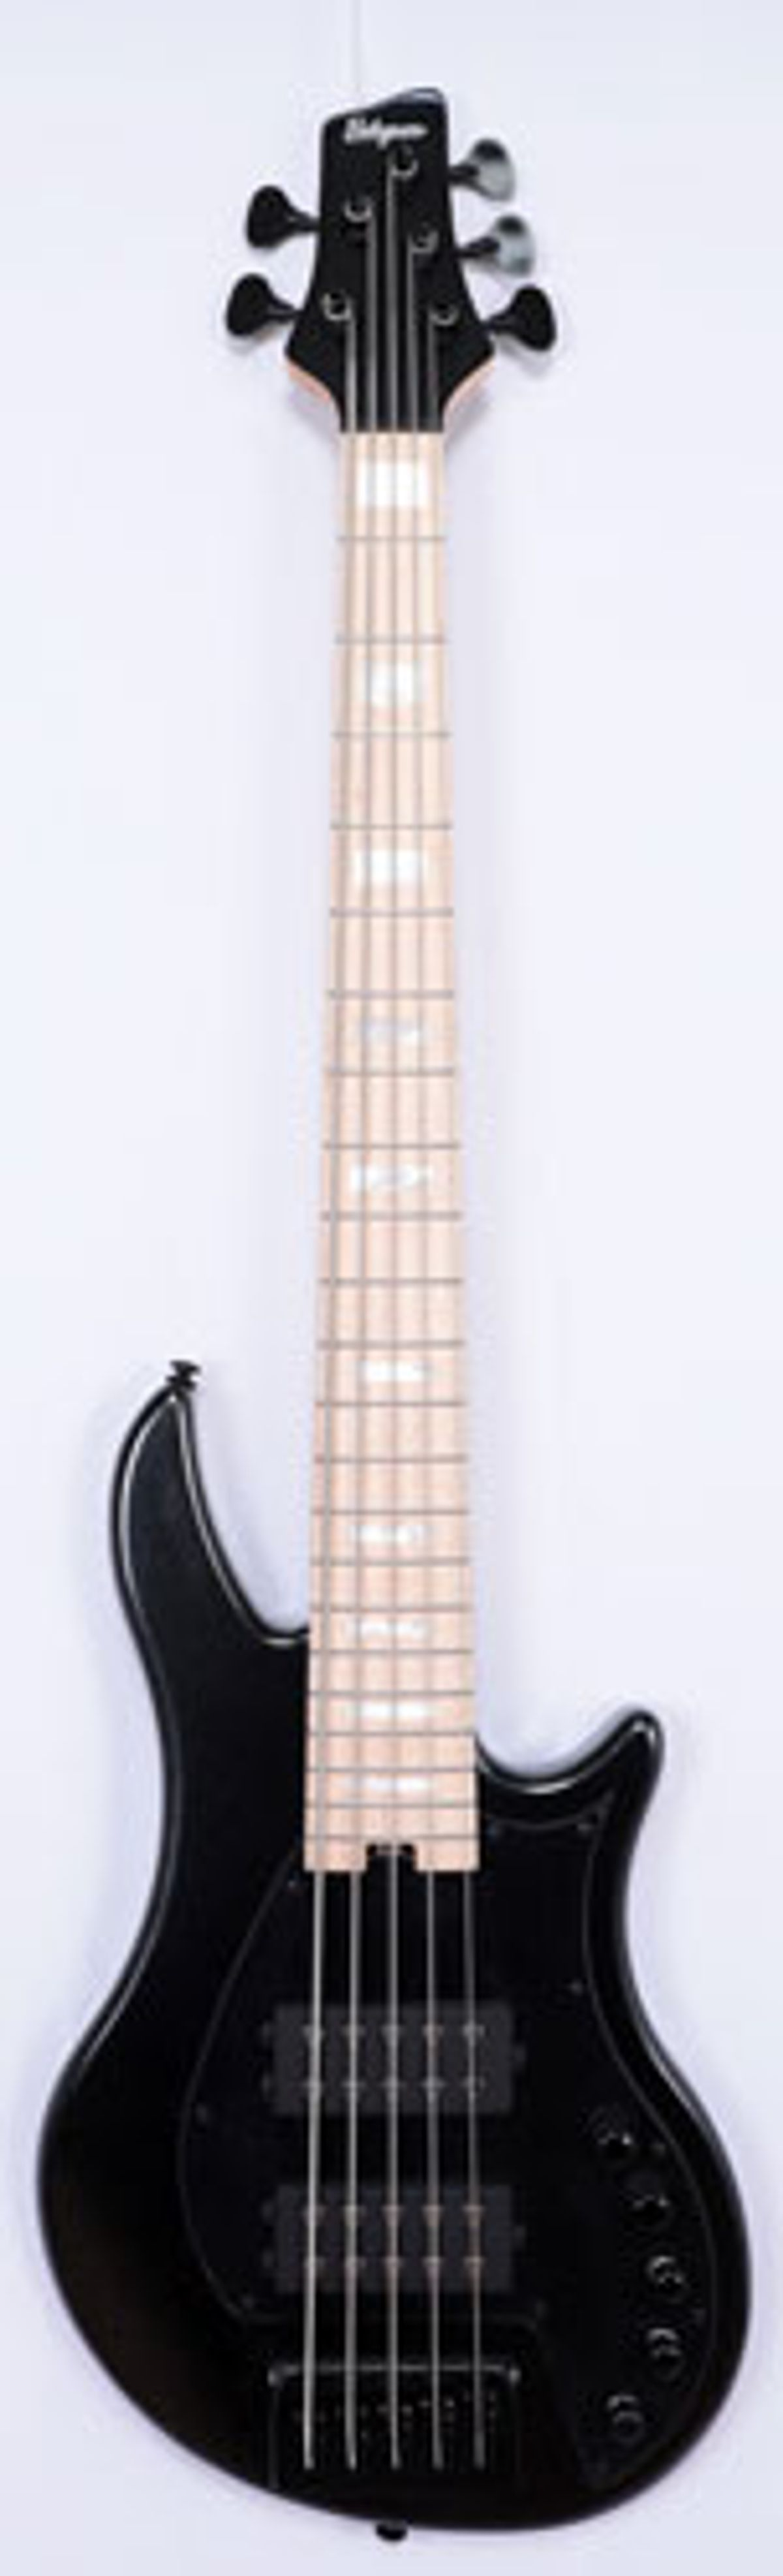 Balaguer Guitars Releases the Monoceros Bass